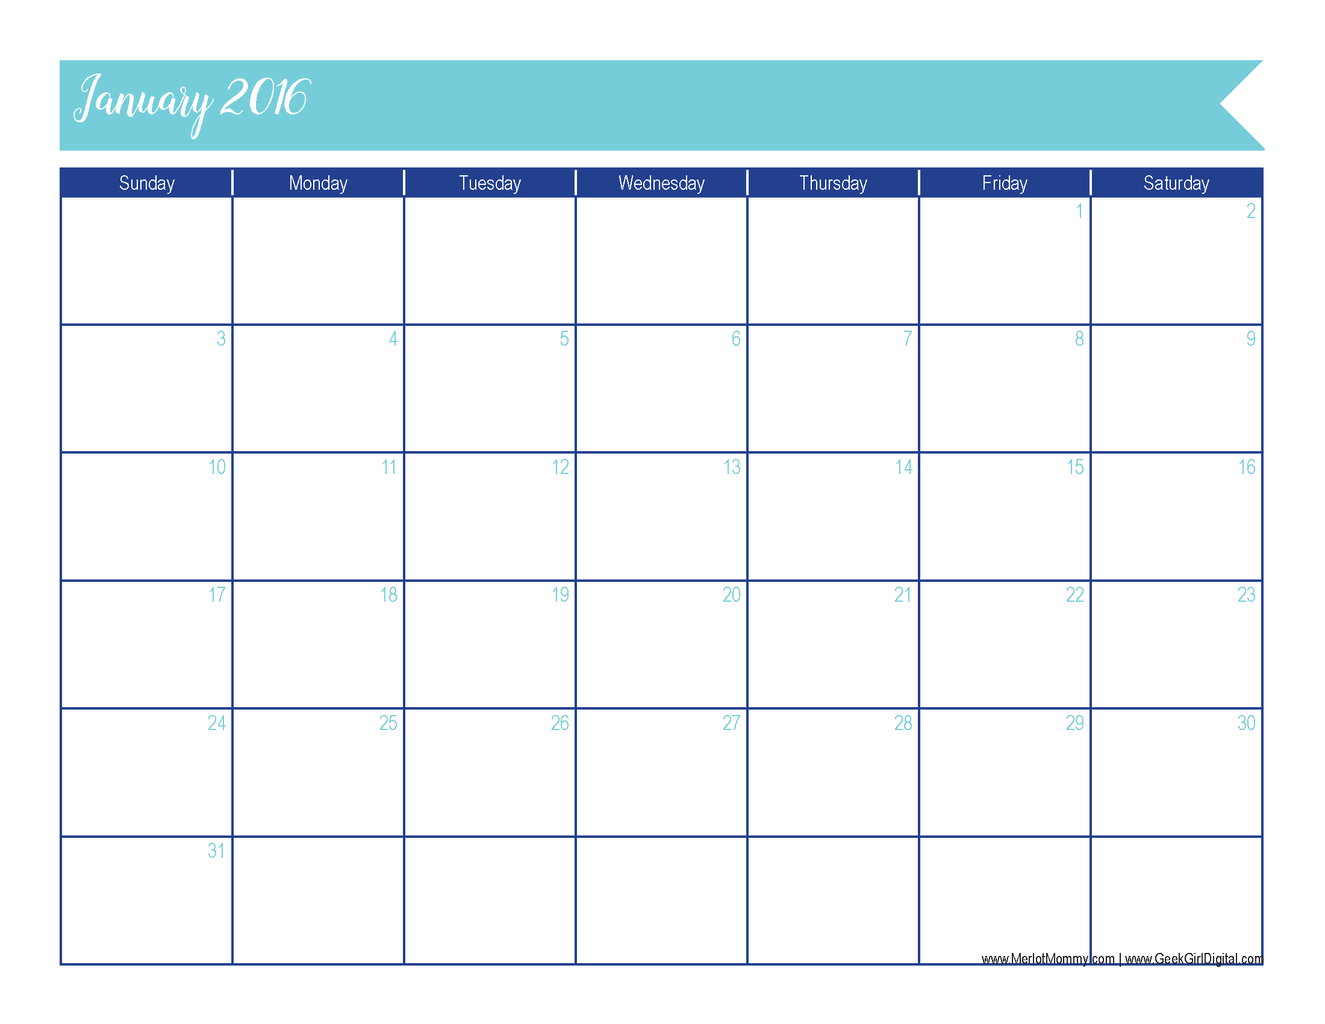 January 2016 Calendar: 30 Days of Free Printables